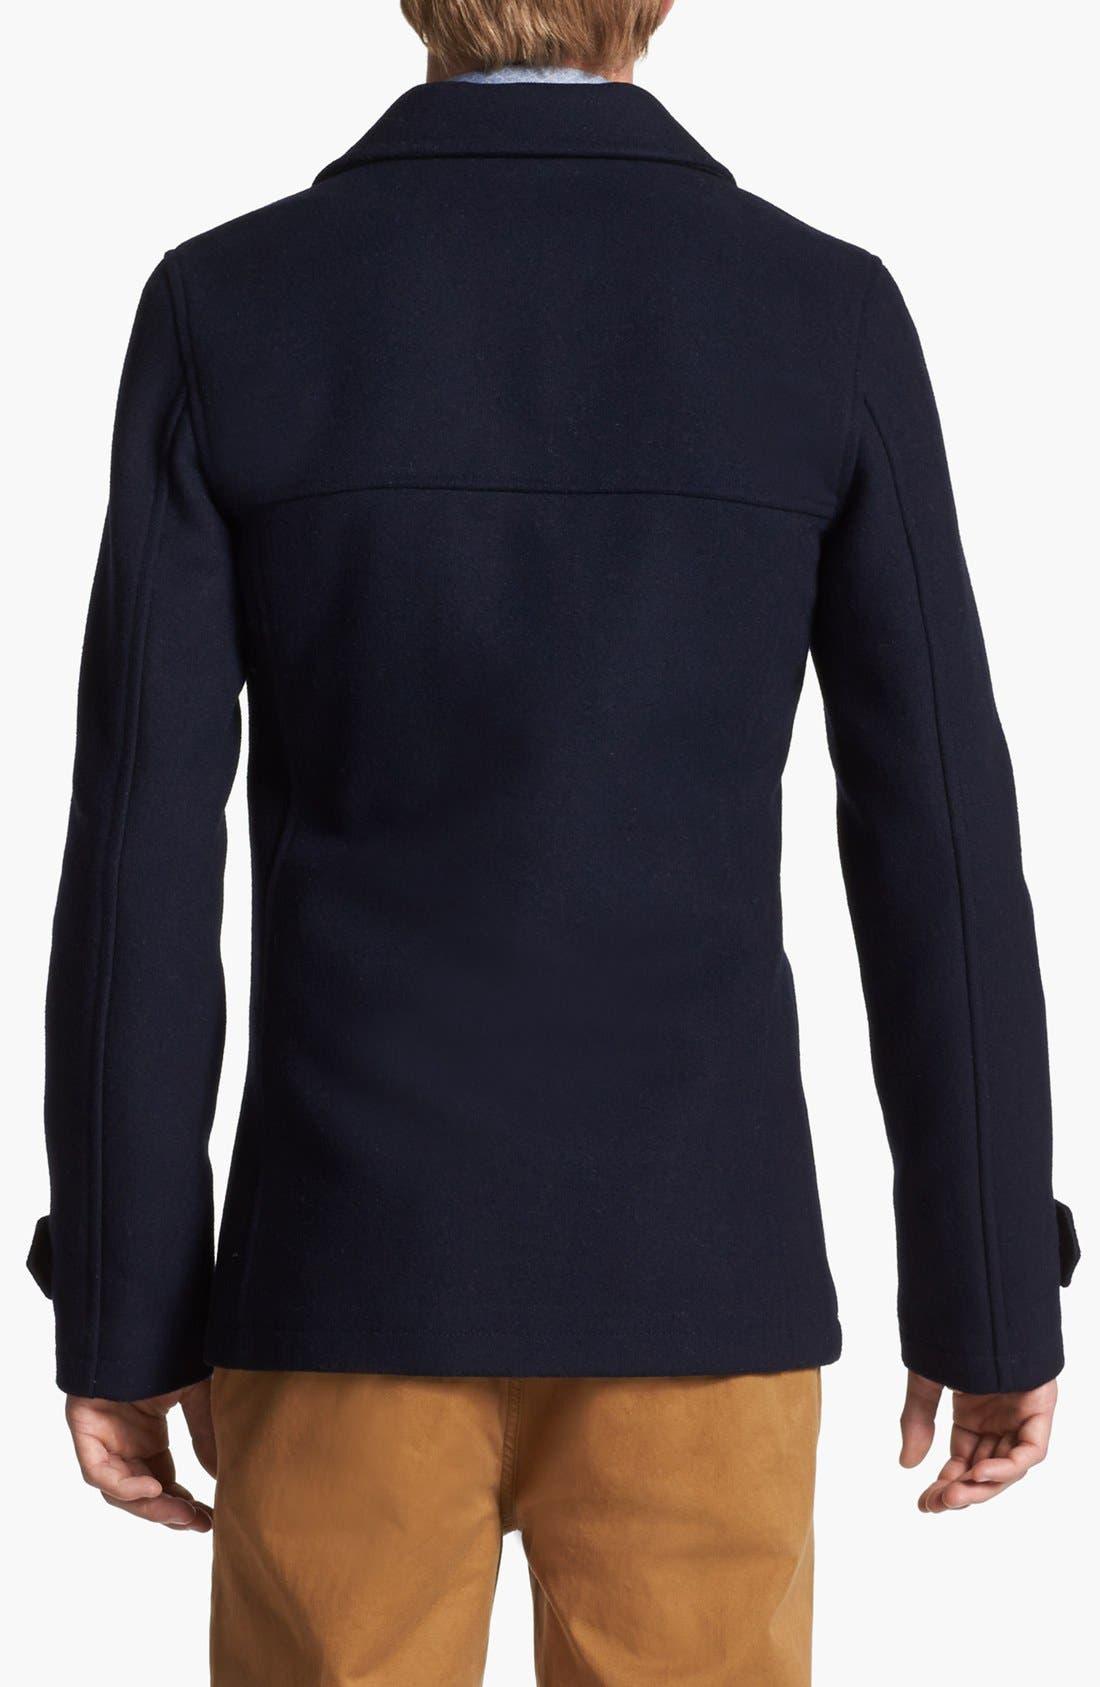 Alternate Image 2  - Topman Skinny Fit Double Breasted Wool Blend Peacoat